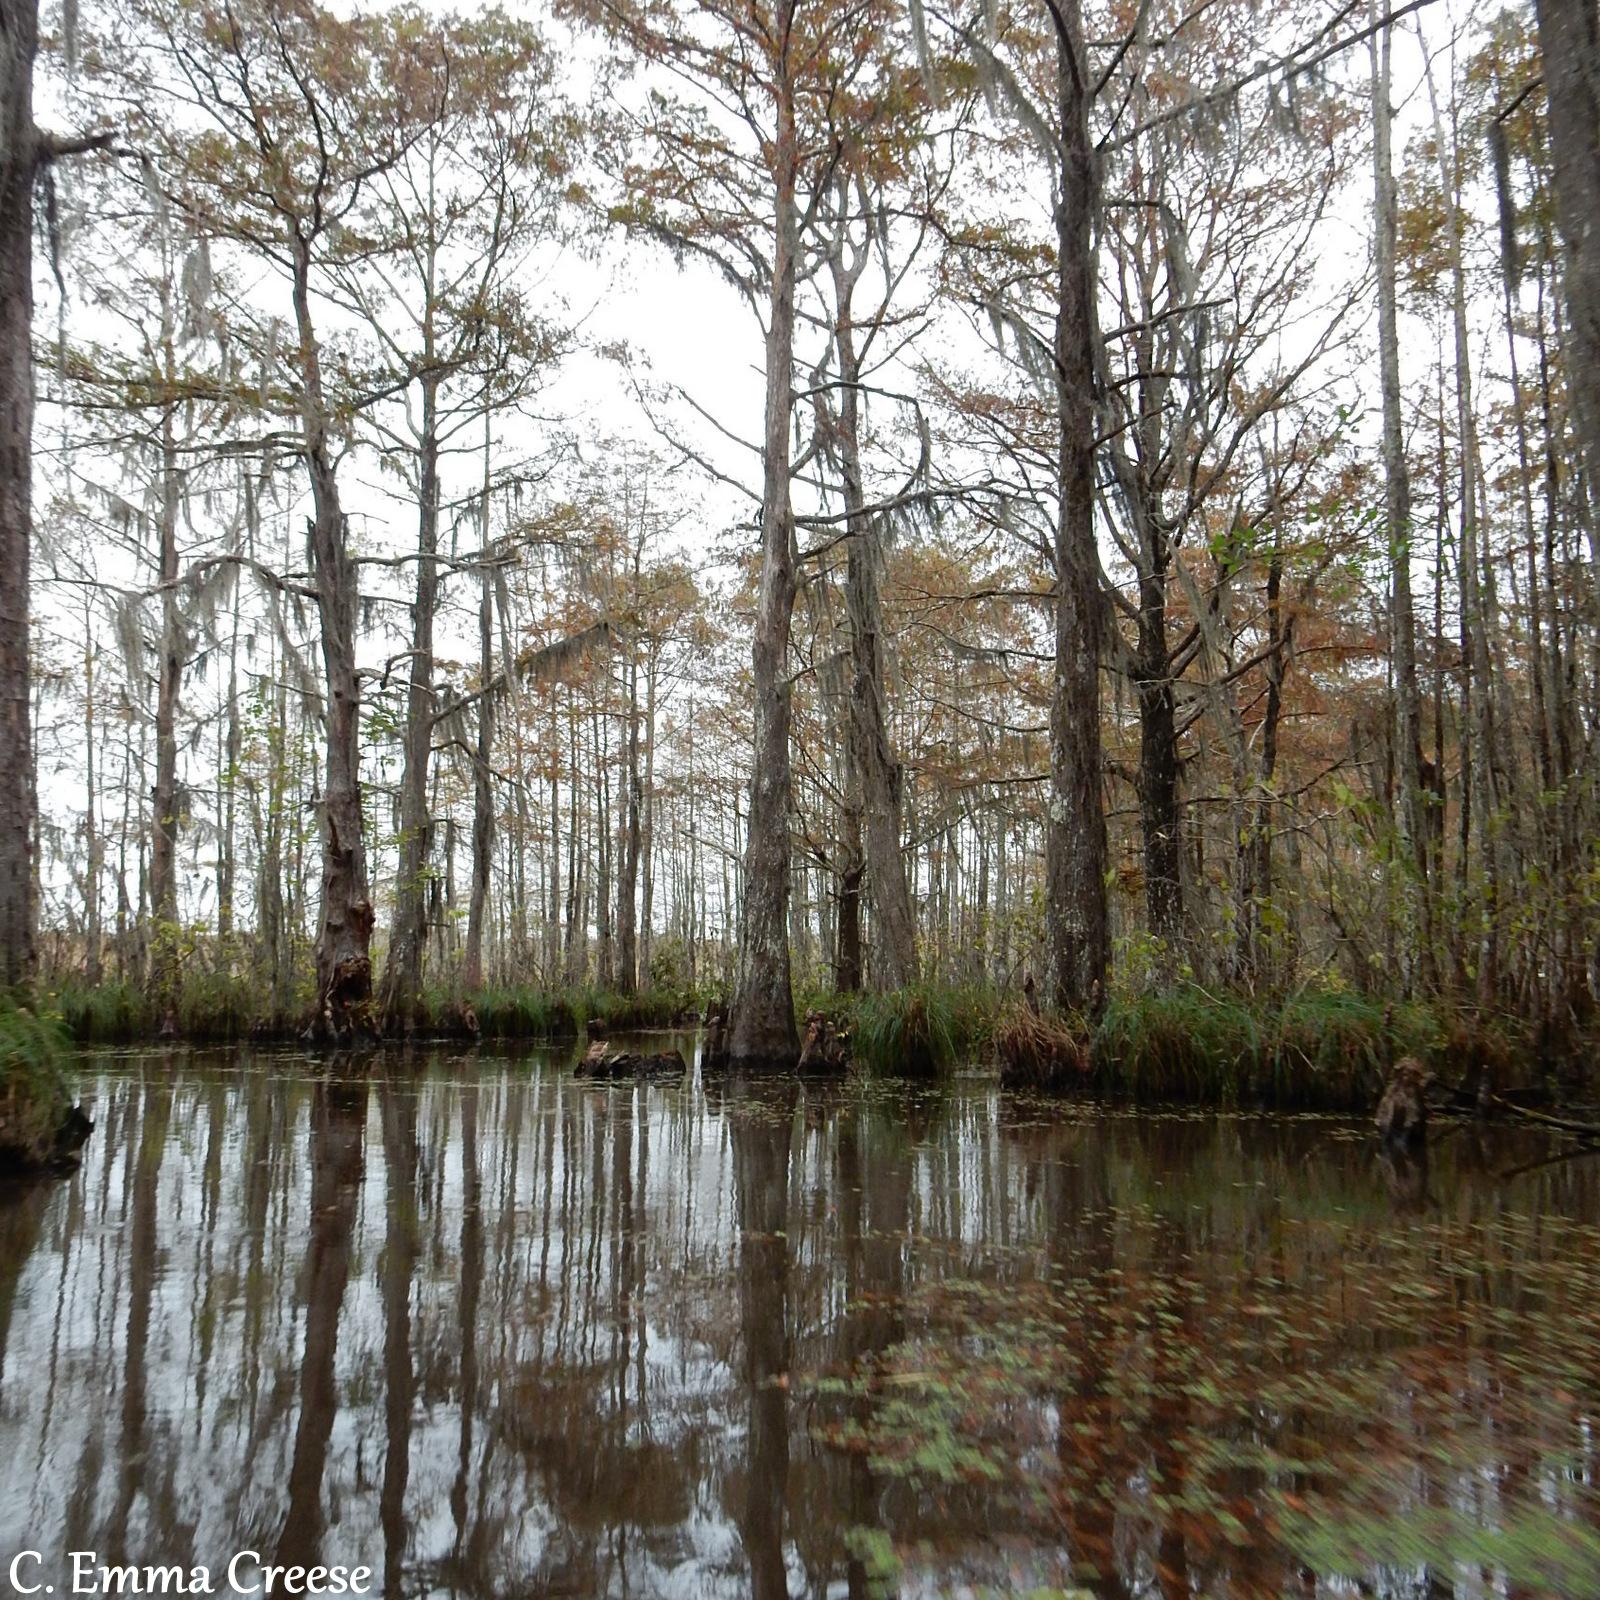 Cajun Swamp Tours New Orleans Bayou Louisiana Adventures of a London Kiwi